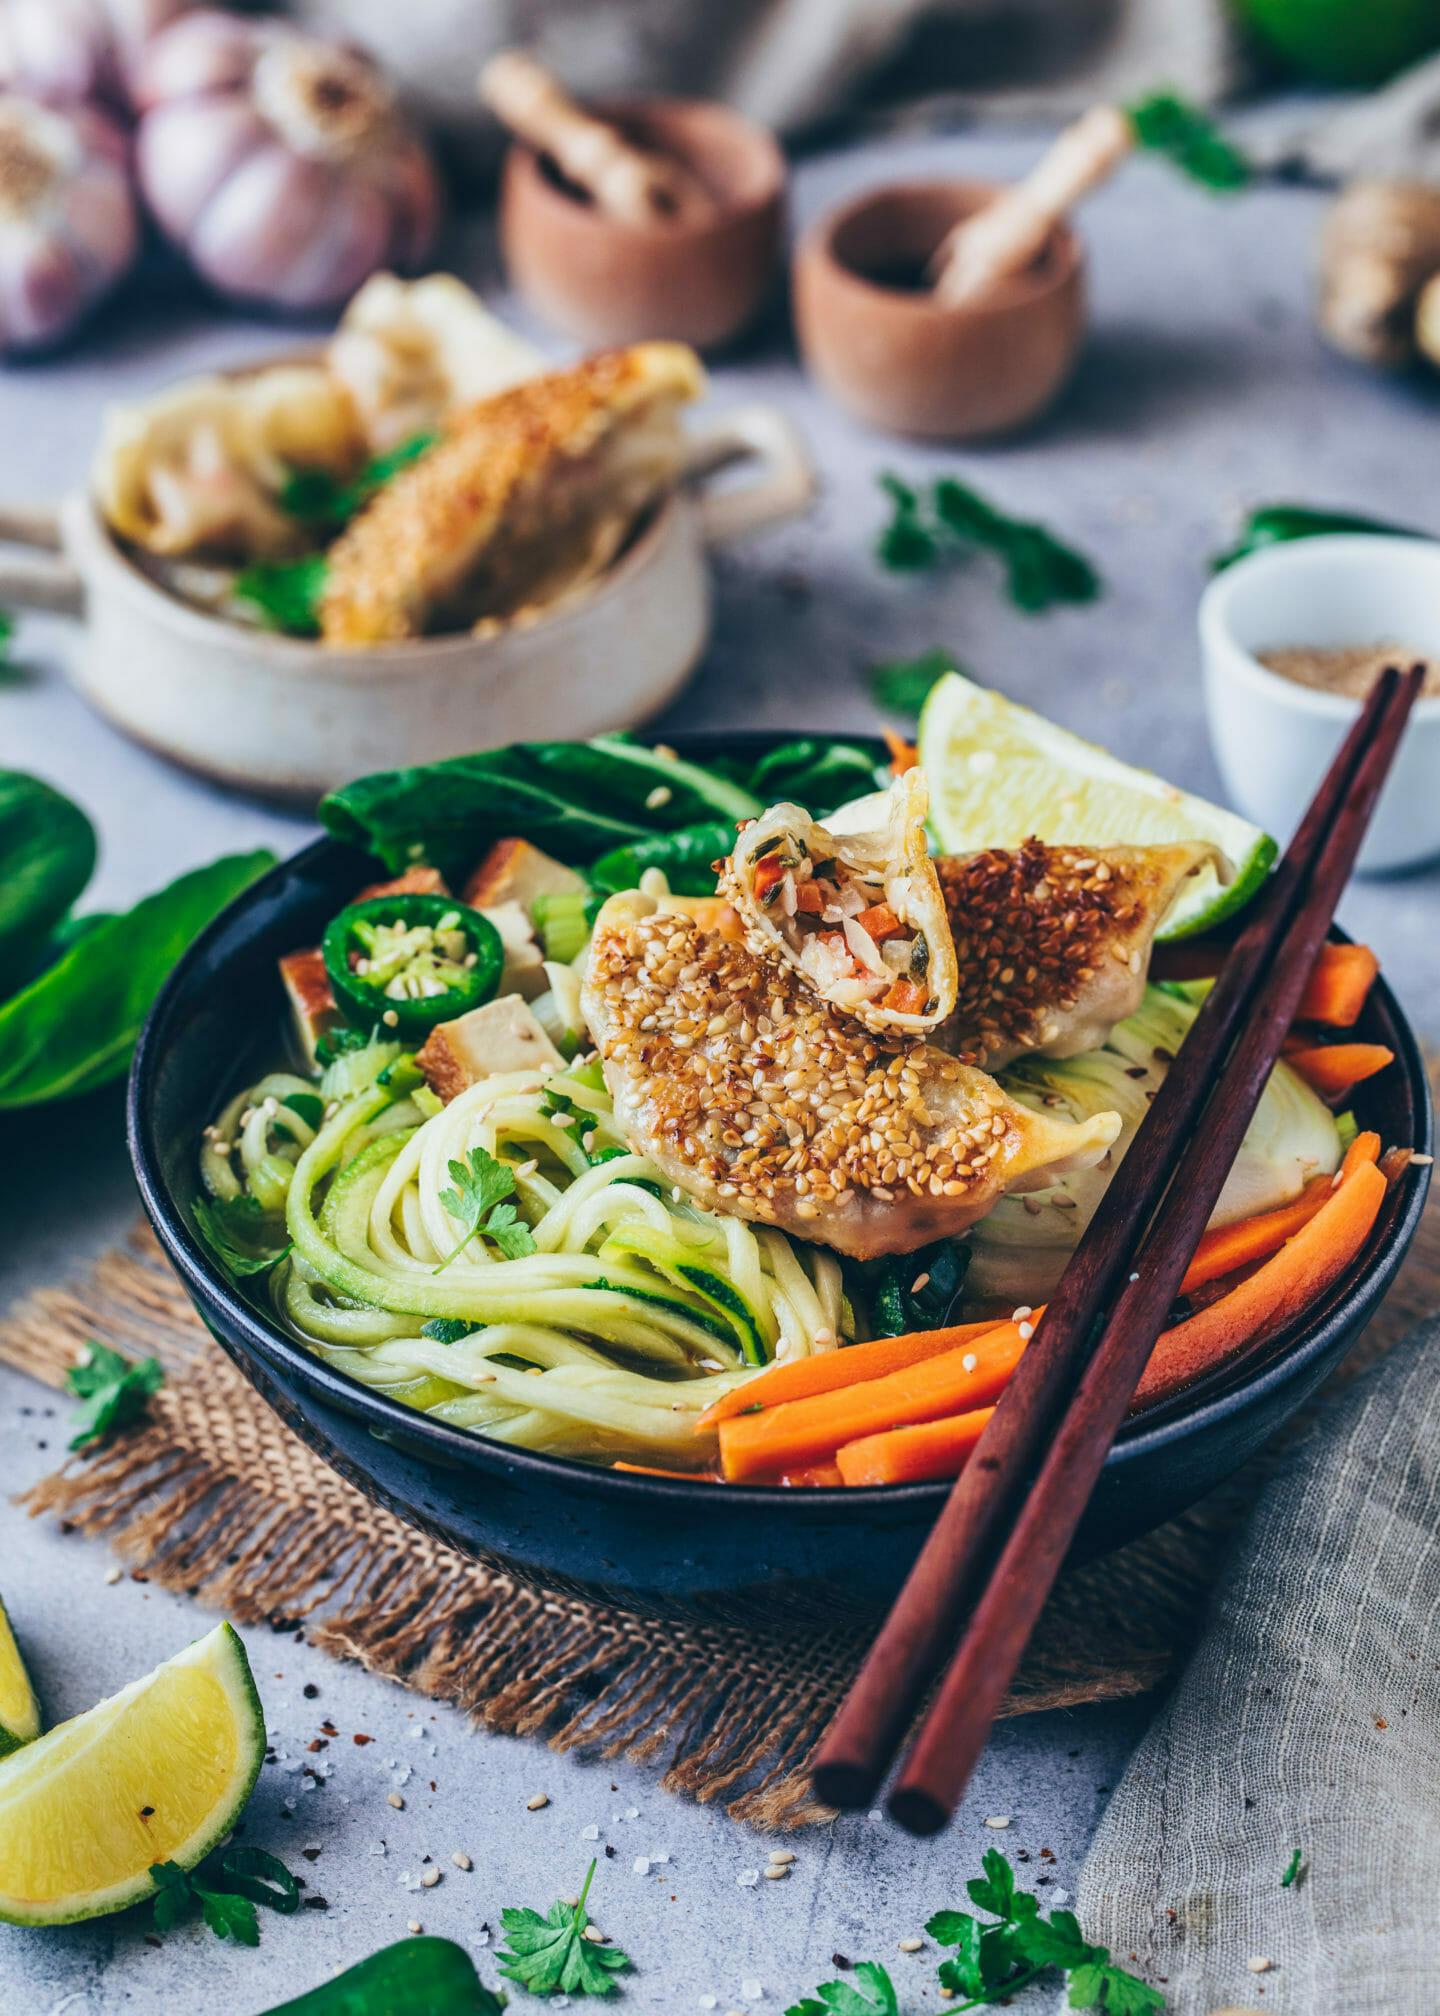 Dumpling Soup with crispy sesame Gyoza and vegetables